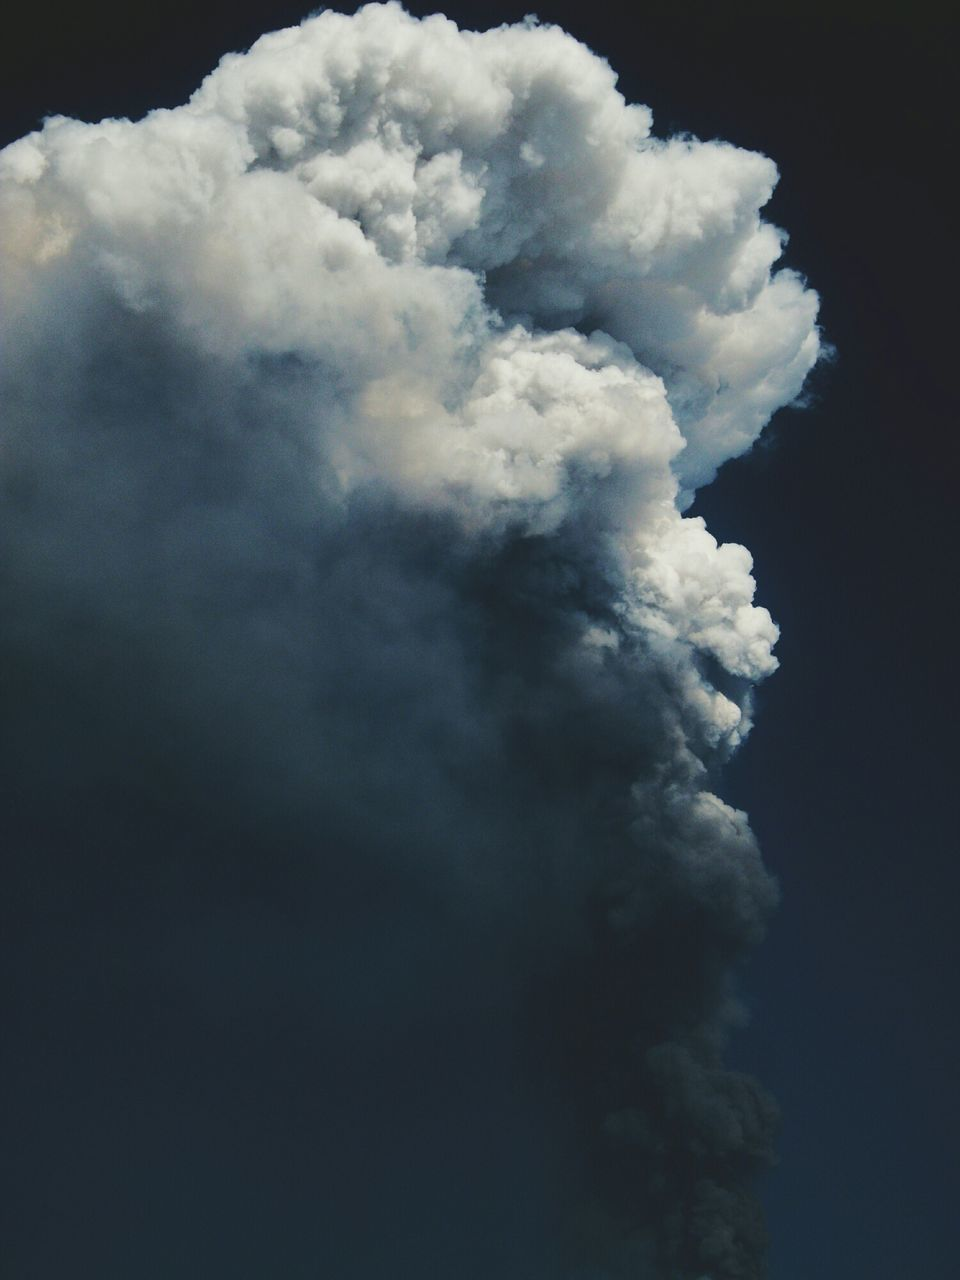 Cloud Of Volcanic Ash Against Dark Sky